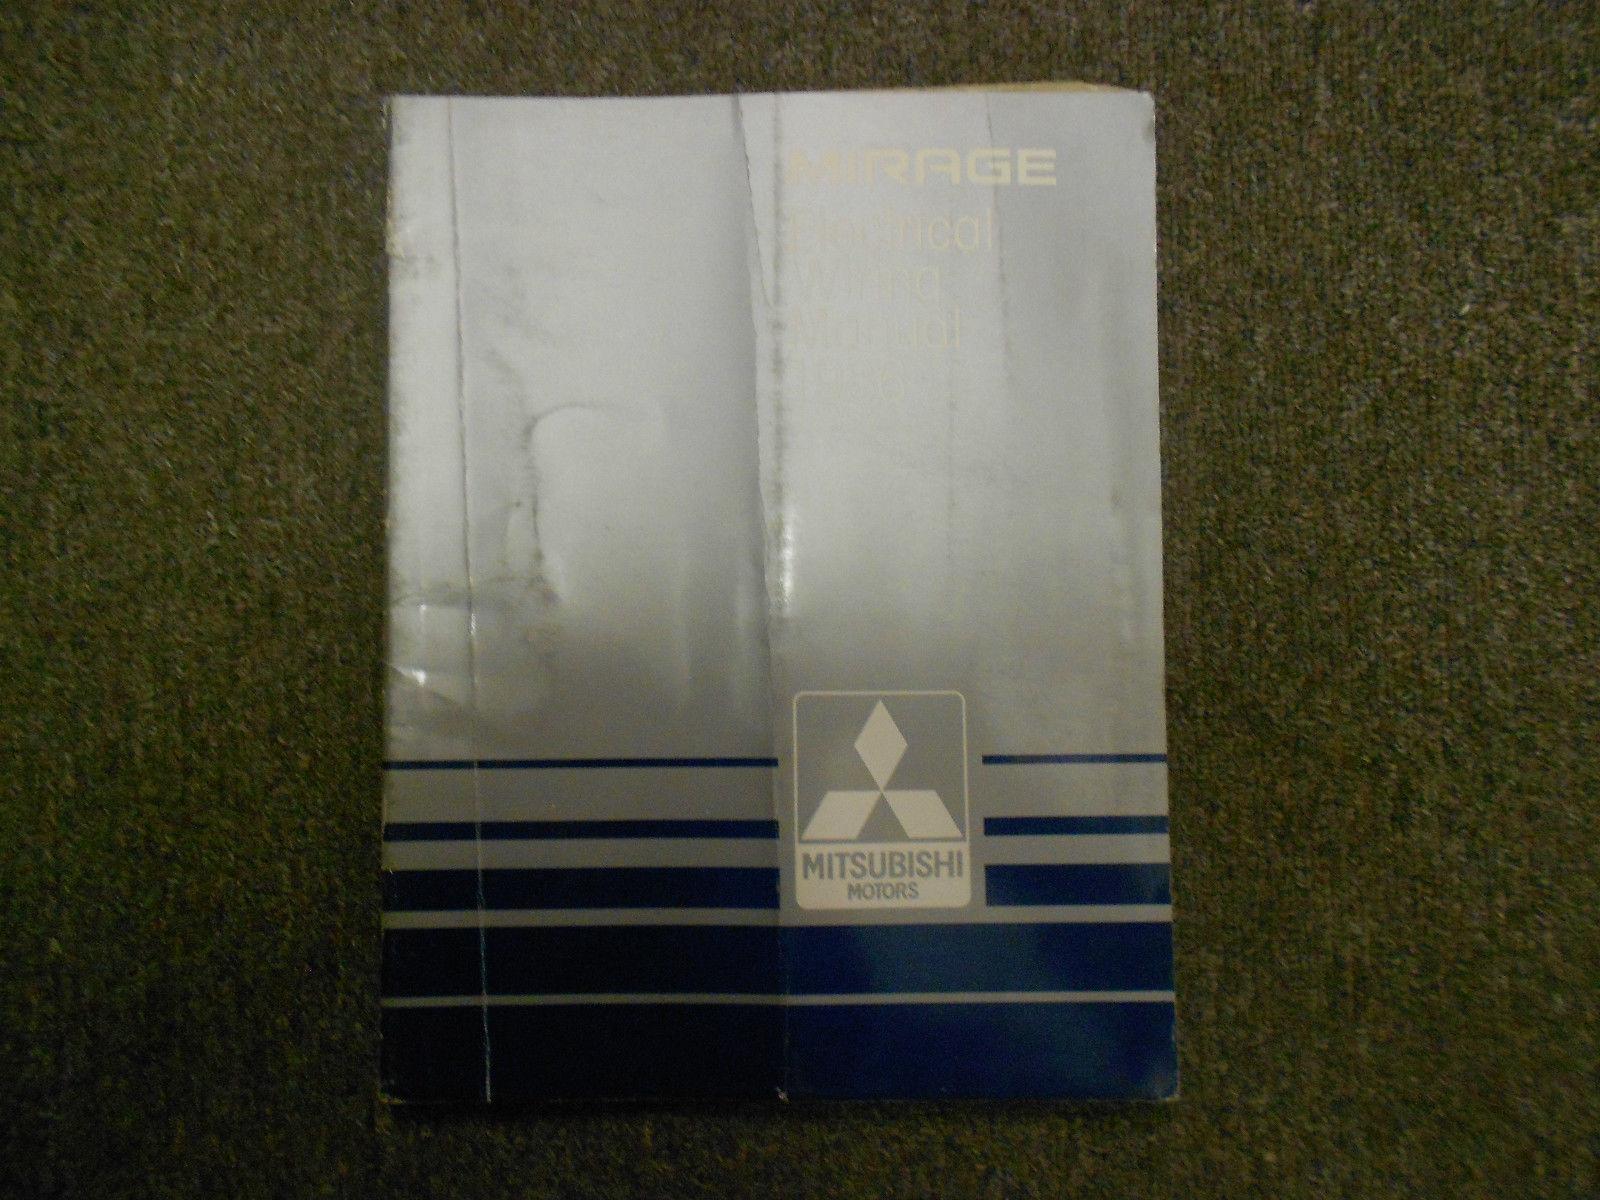 1997 MITSUBISHI Galant Service Repair Shop Manual FACTORY OEM BOOK 97 SET DEAL